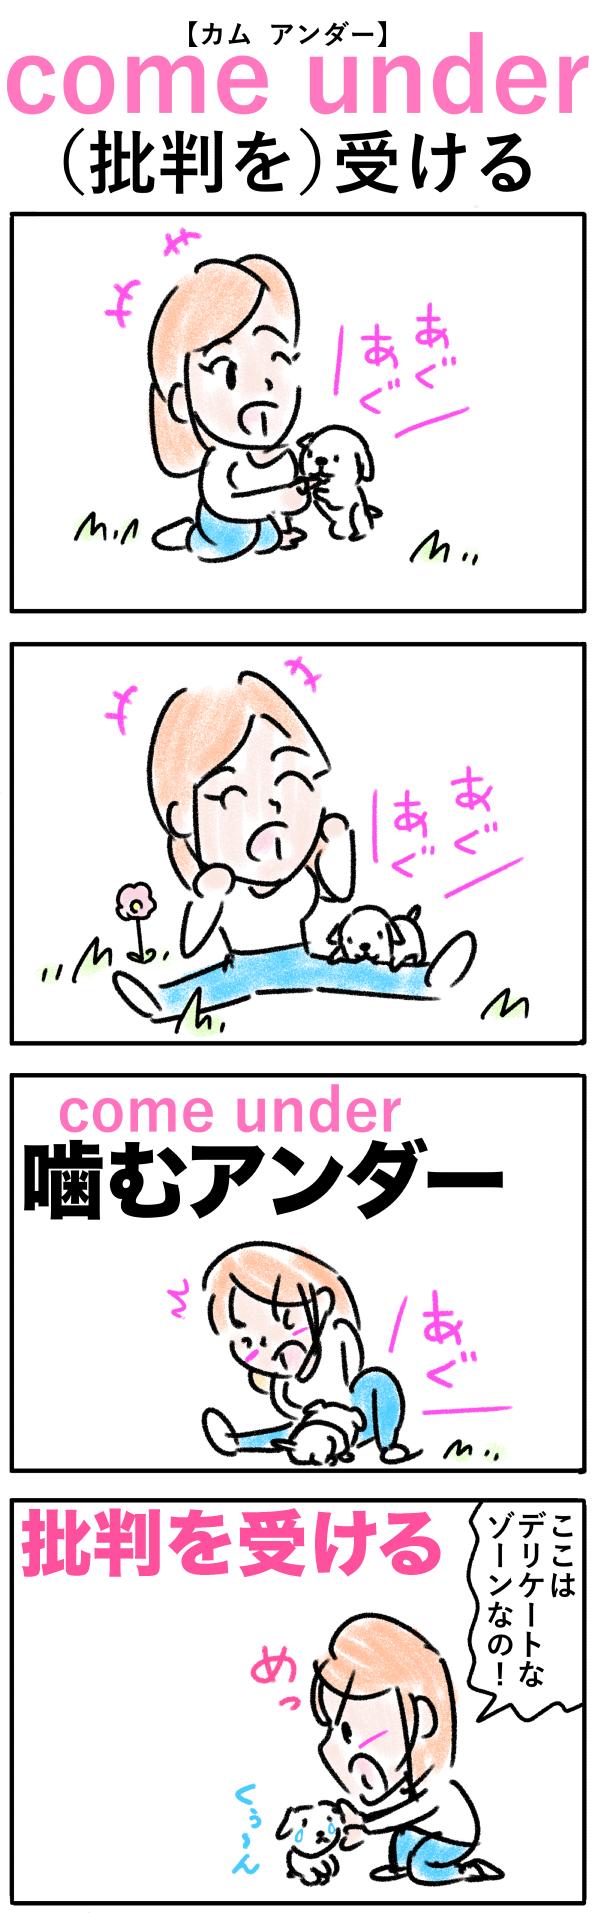 come under(批判を)受けるの語呂合わせ英単語